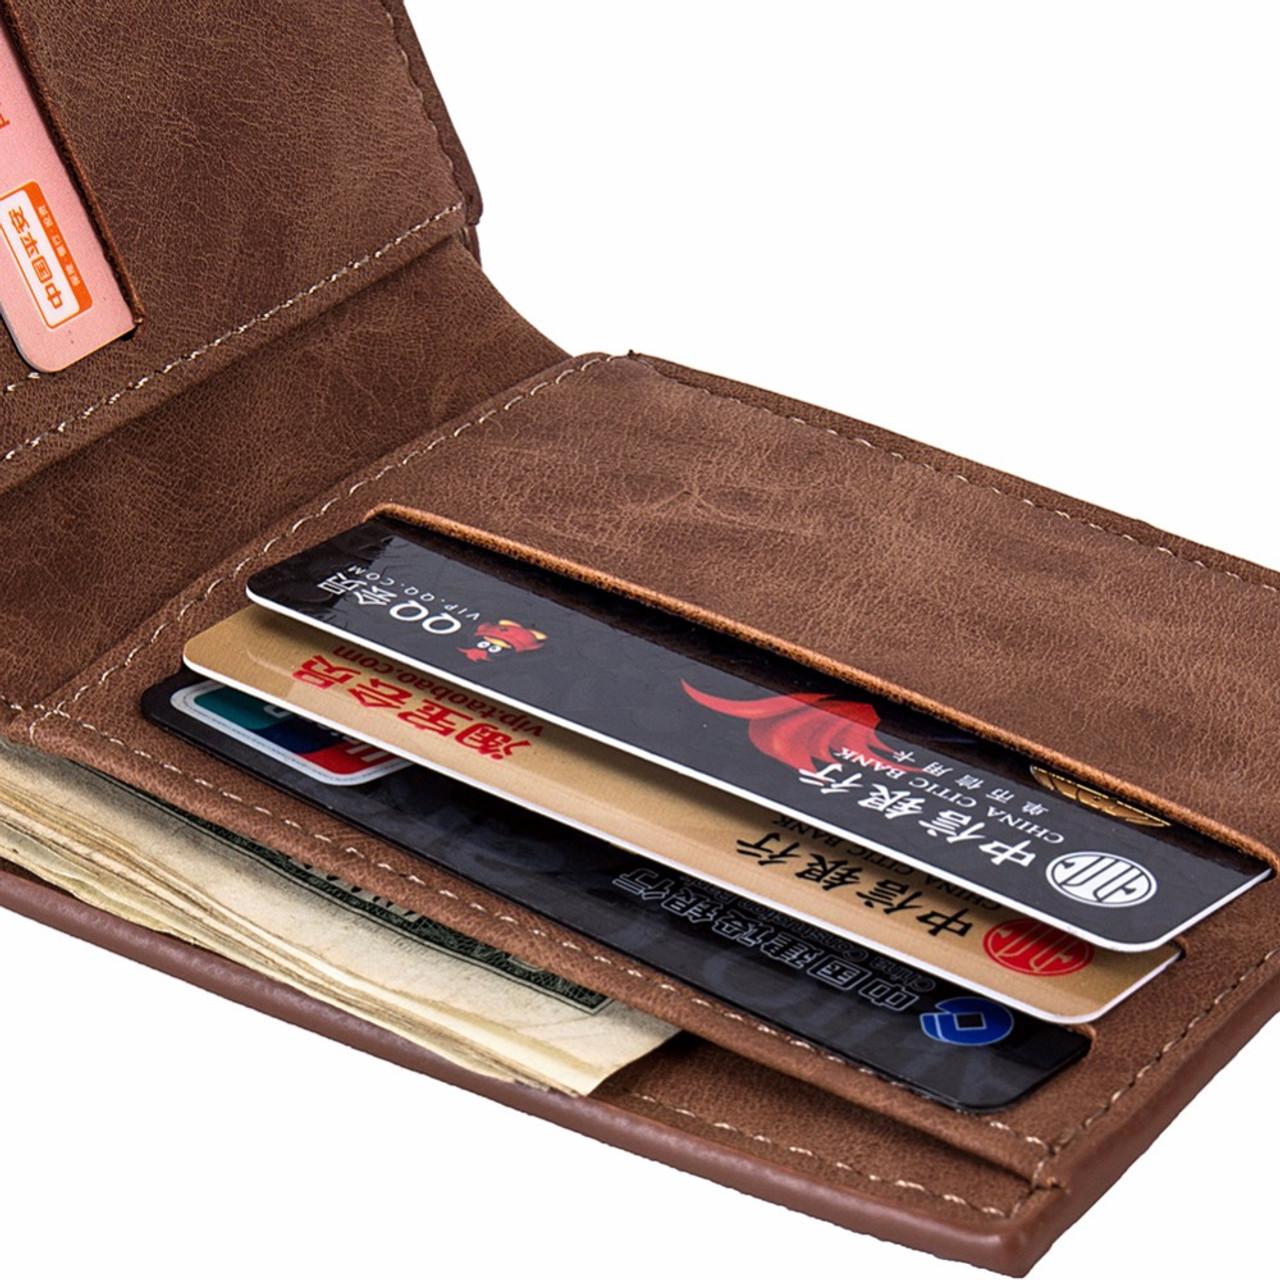 f3c8385daf Men Wallets Top Pu Leather Vintage Design Purse Men Brand Famous Card  holder Mens Wallet carteira masculina Wholesale price